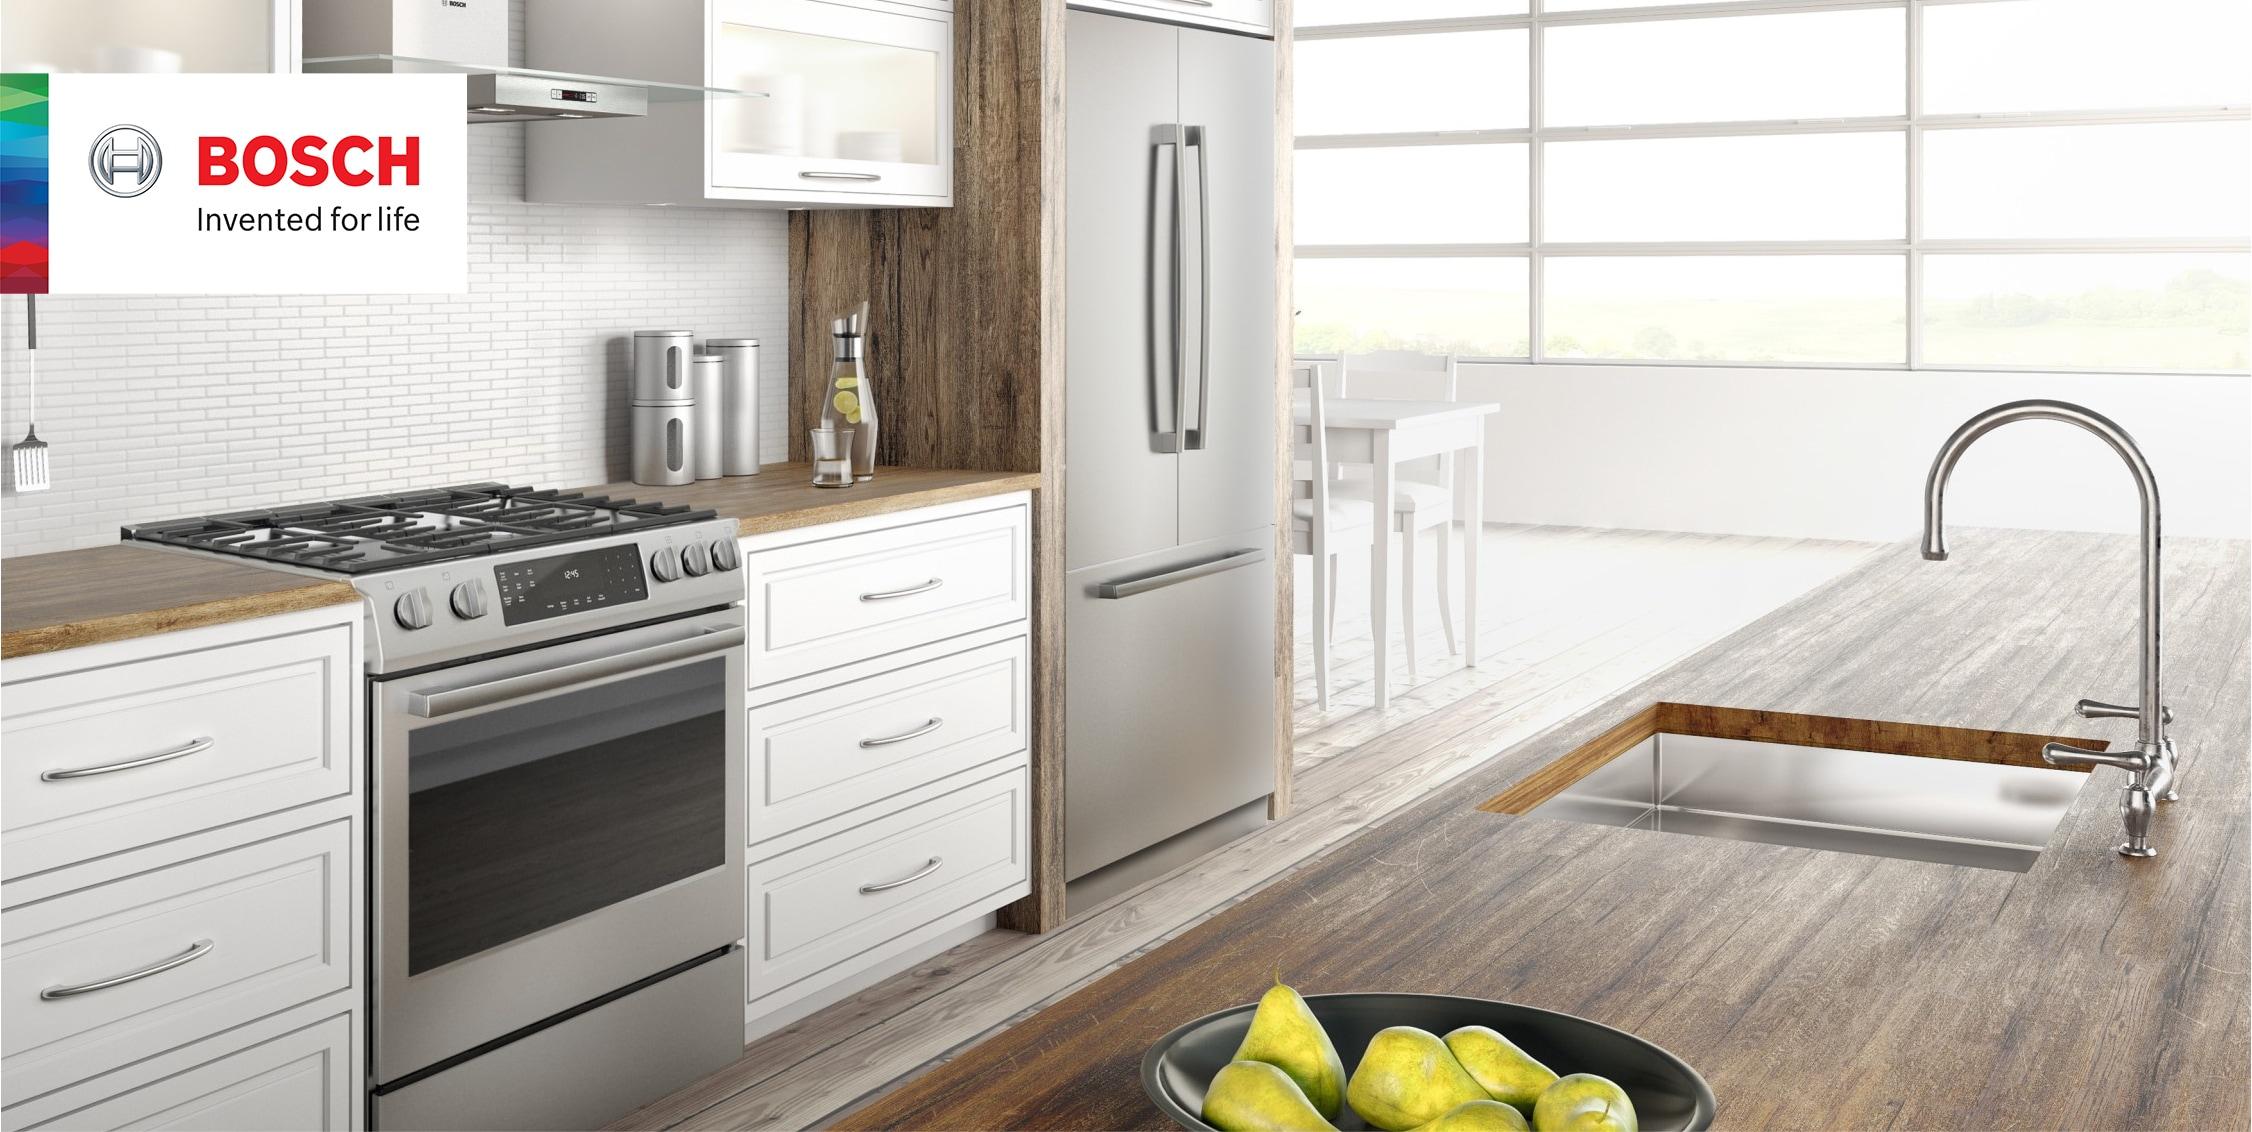 Bosch Save 15 Percent Home Appliances Kitchen Appliances In San Francisco Ca 94110